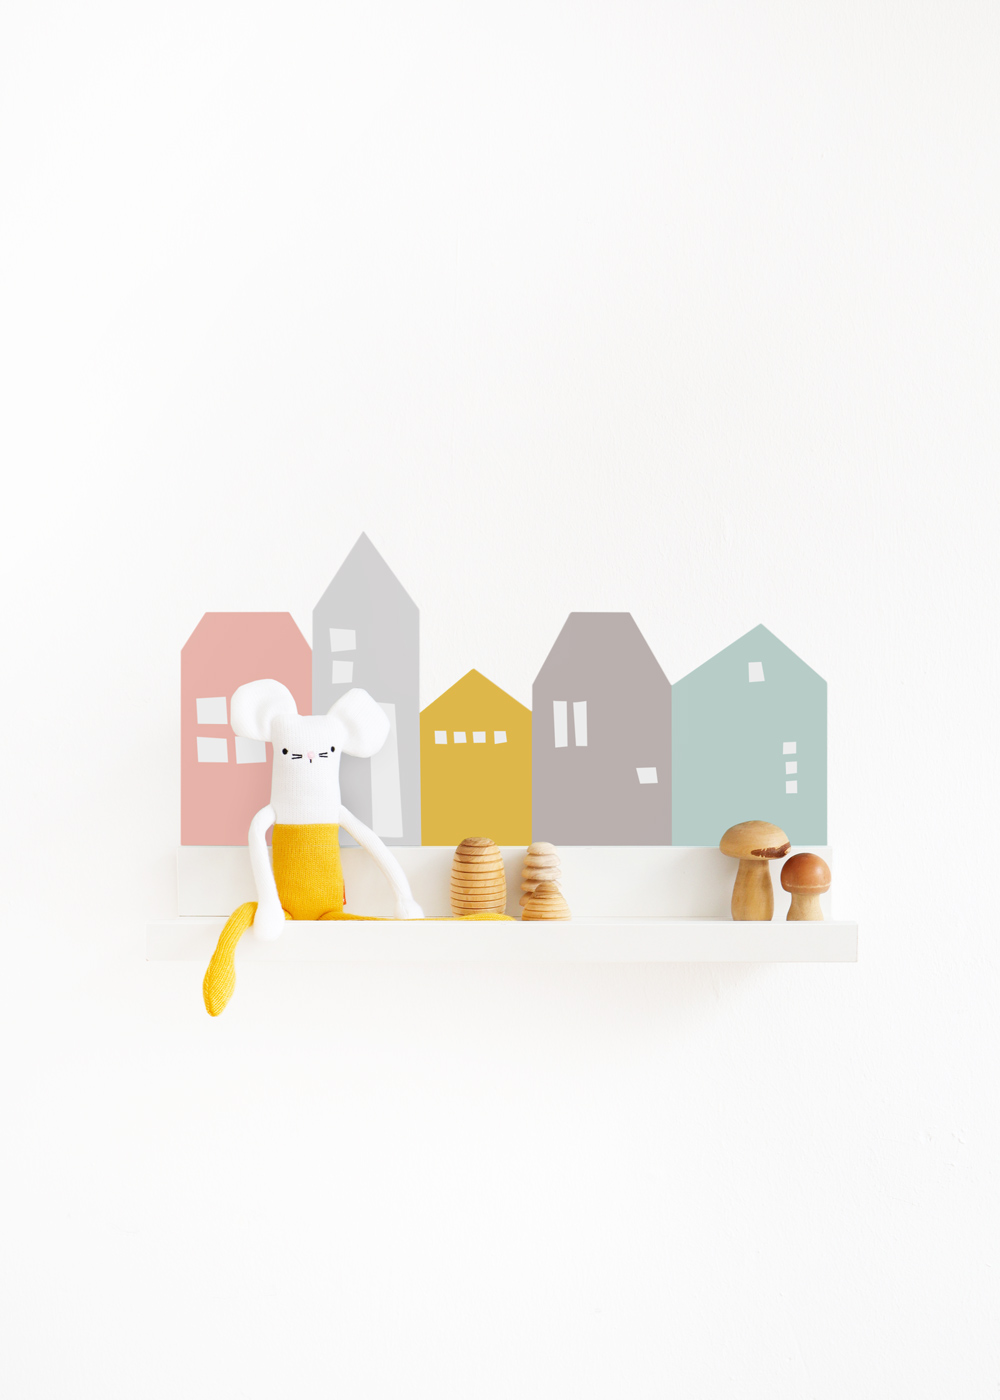 Ikea Mosslanda Bilderleiste Lille Hus rosa hellgrau Komplettansicht